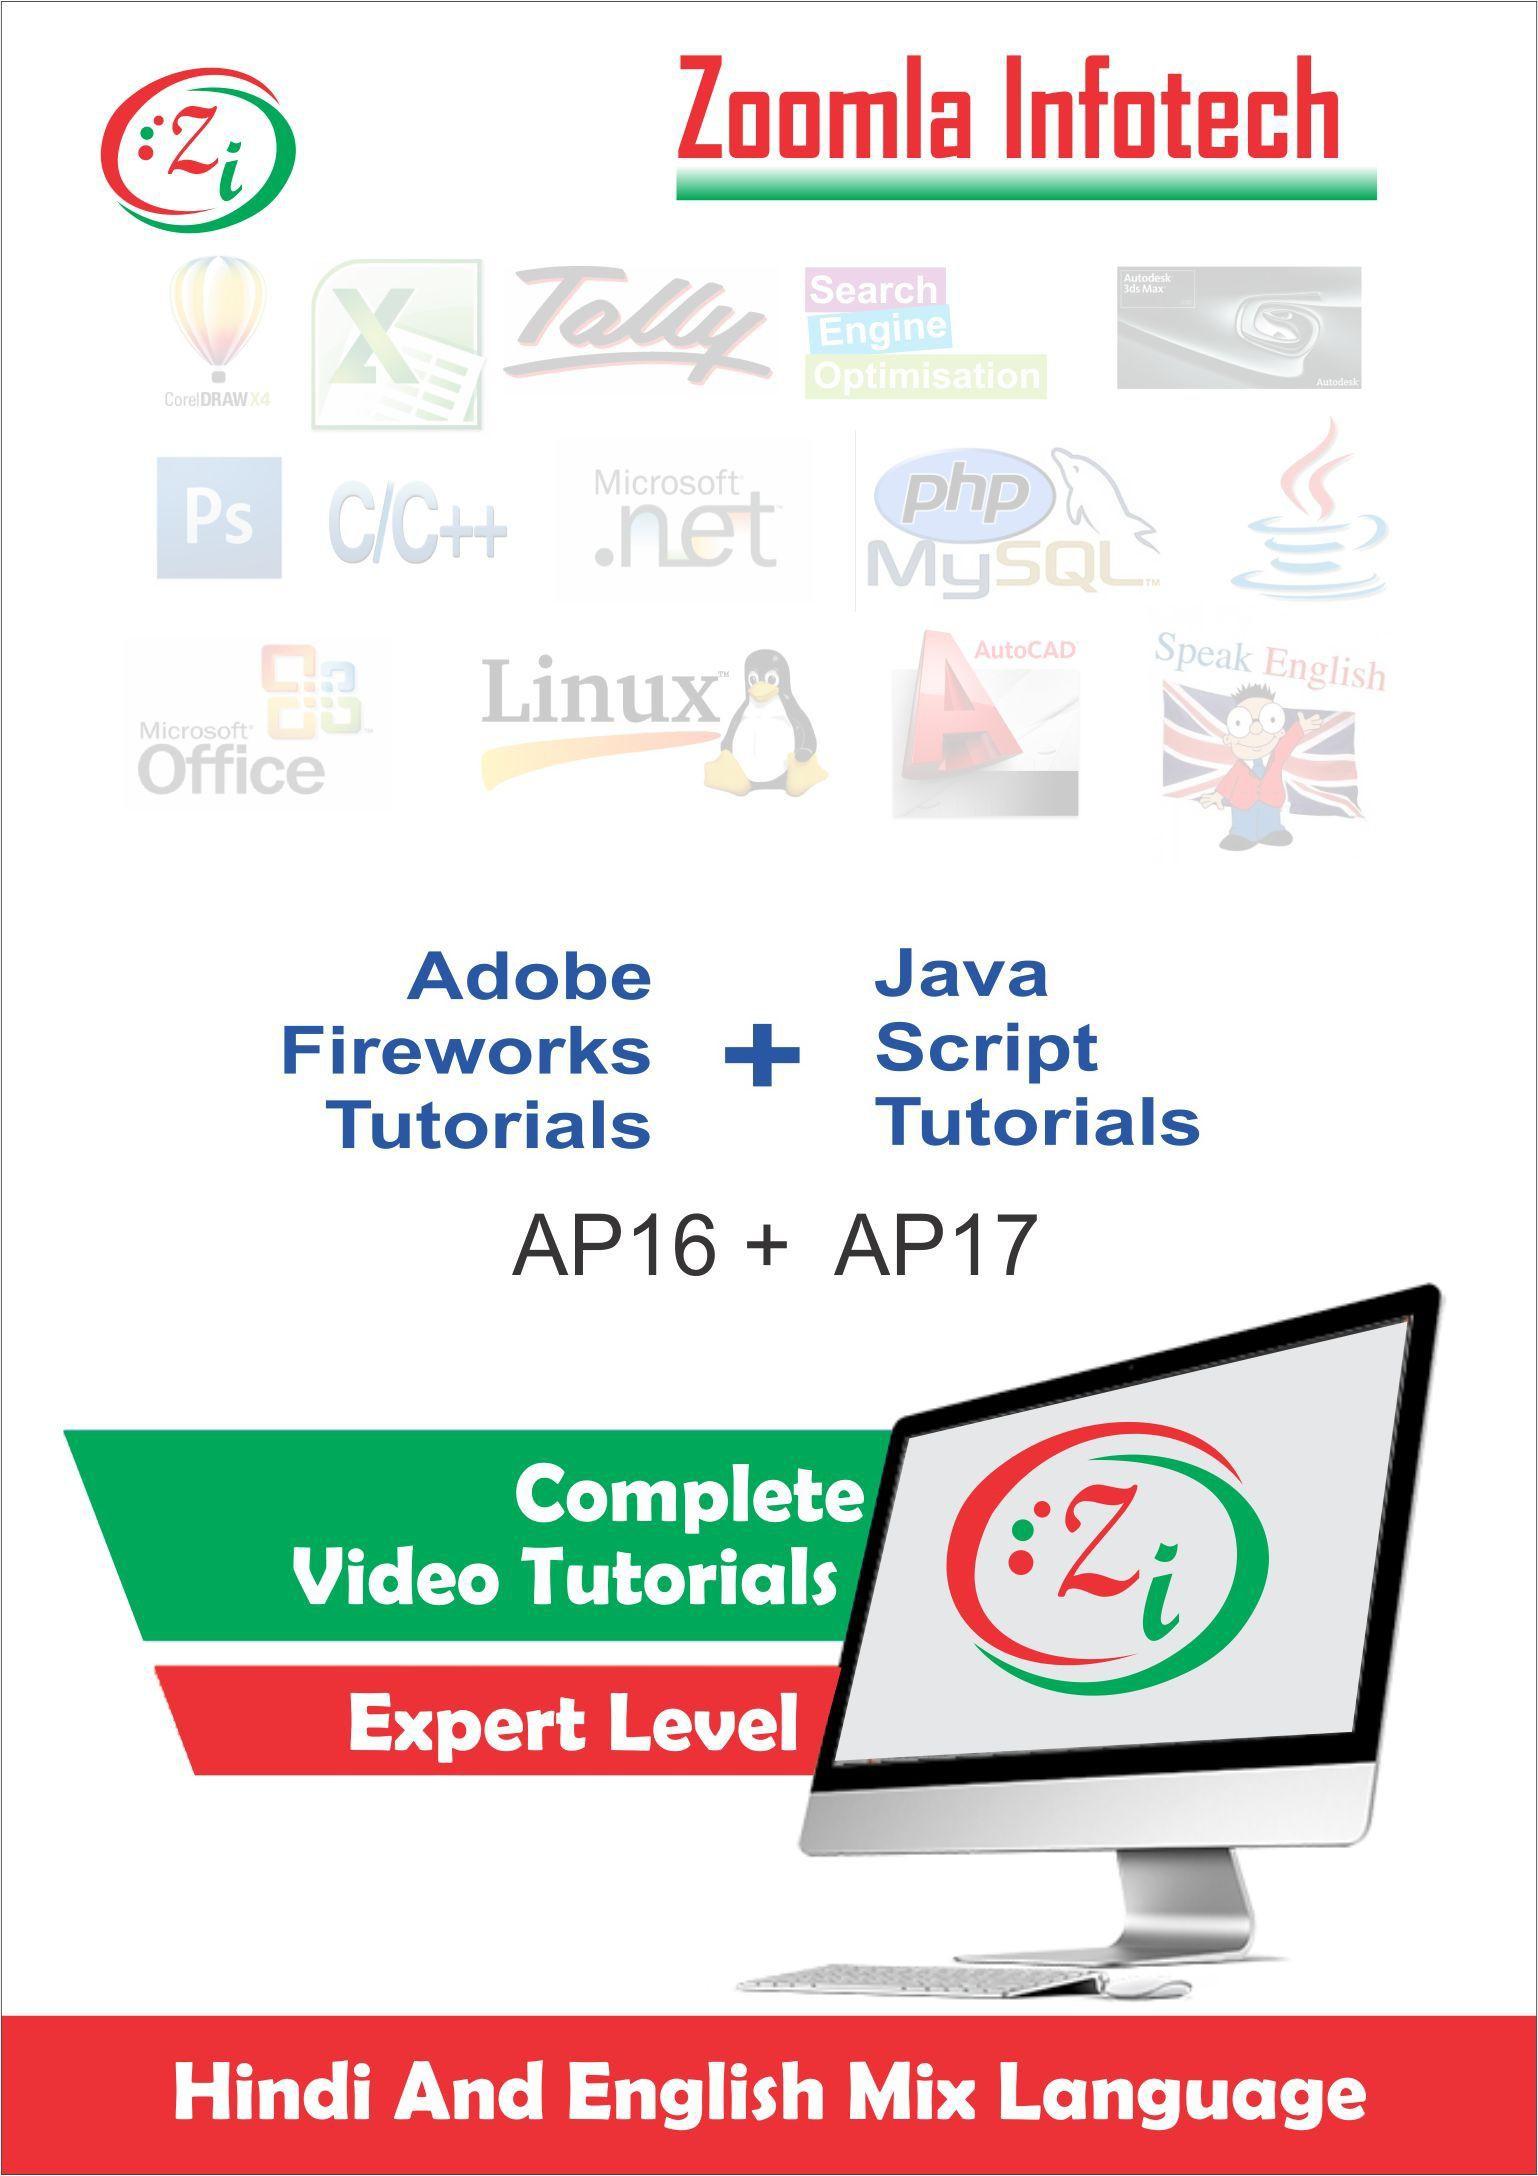 Javascripts - Zoomla Infotech Adobe Fireworks For Designers Java Scripts Basics Learning Video Tutorials Dvd Cd